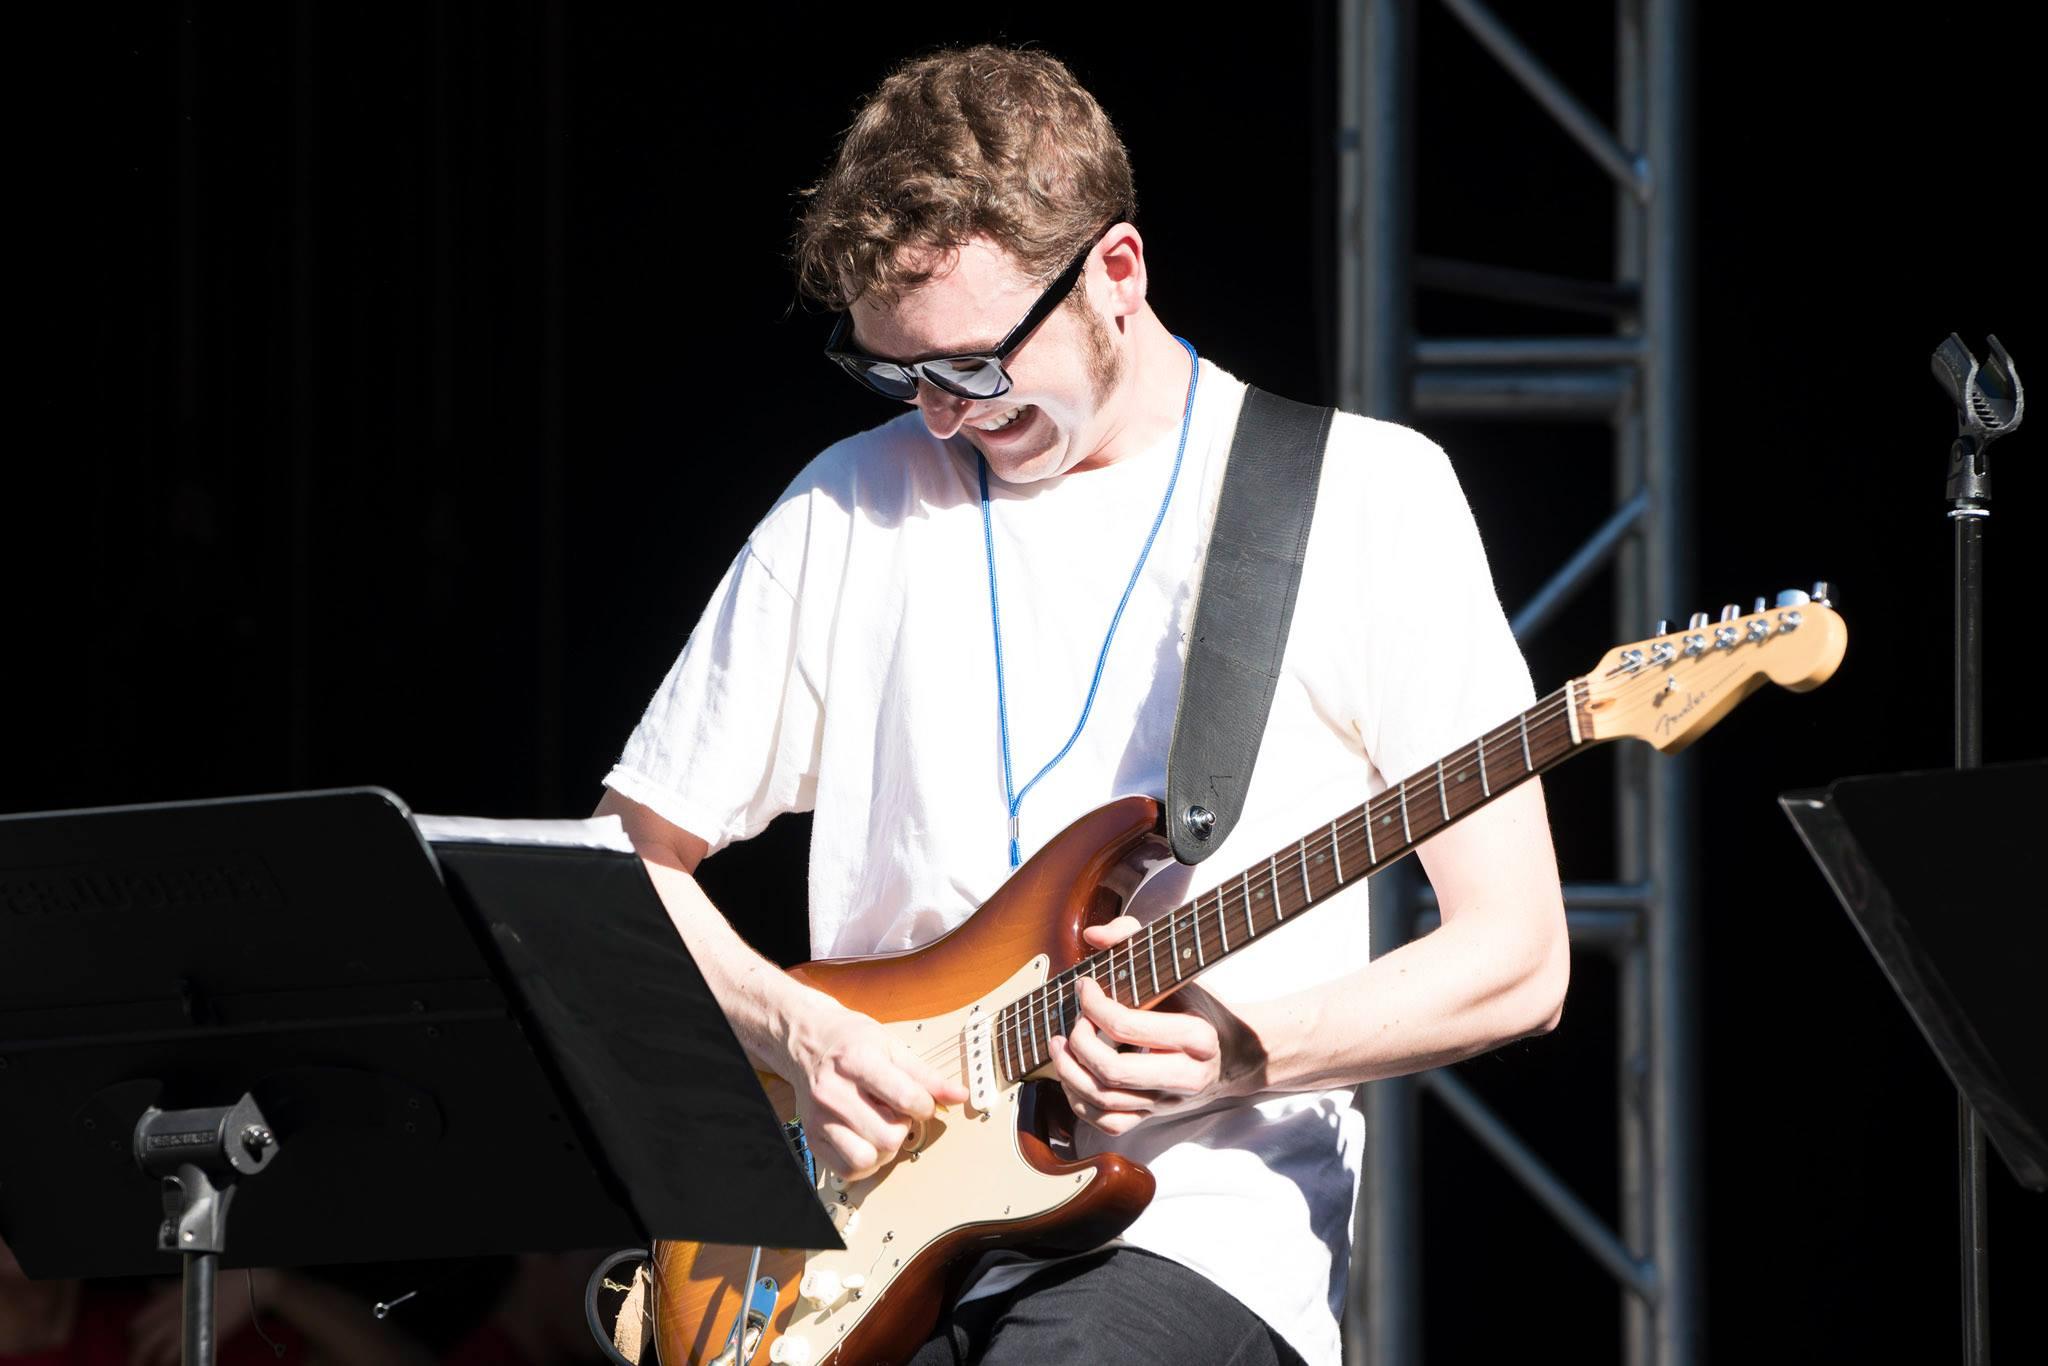 Soundchecking at the Starlight Bowl, Burbank, CA